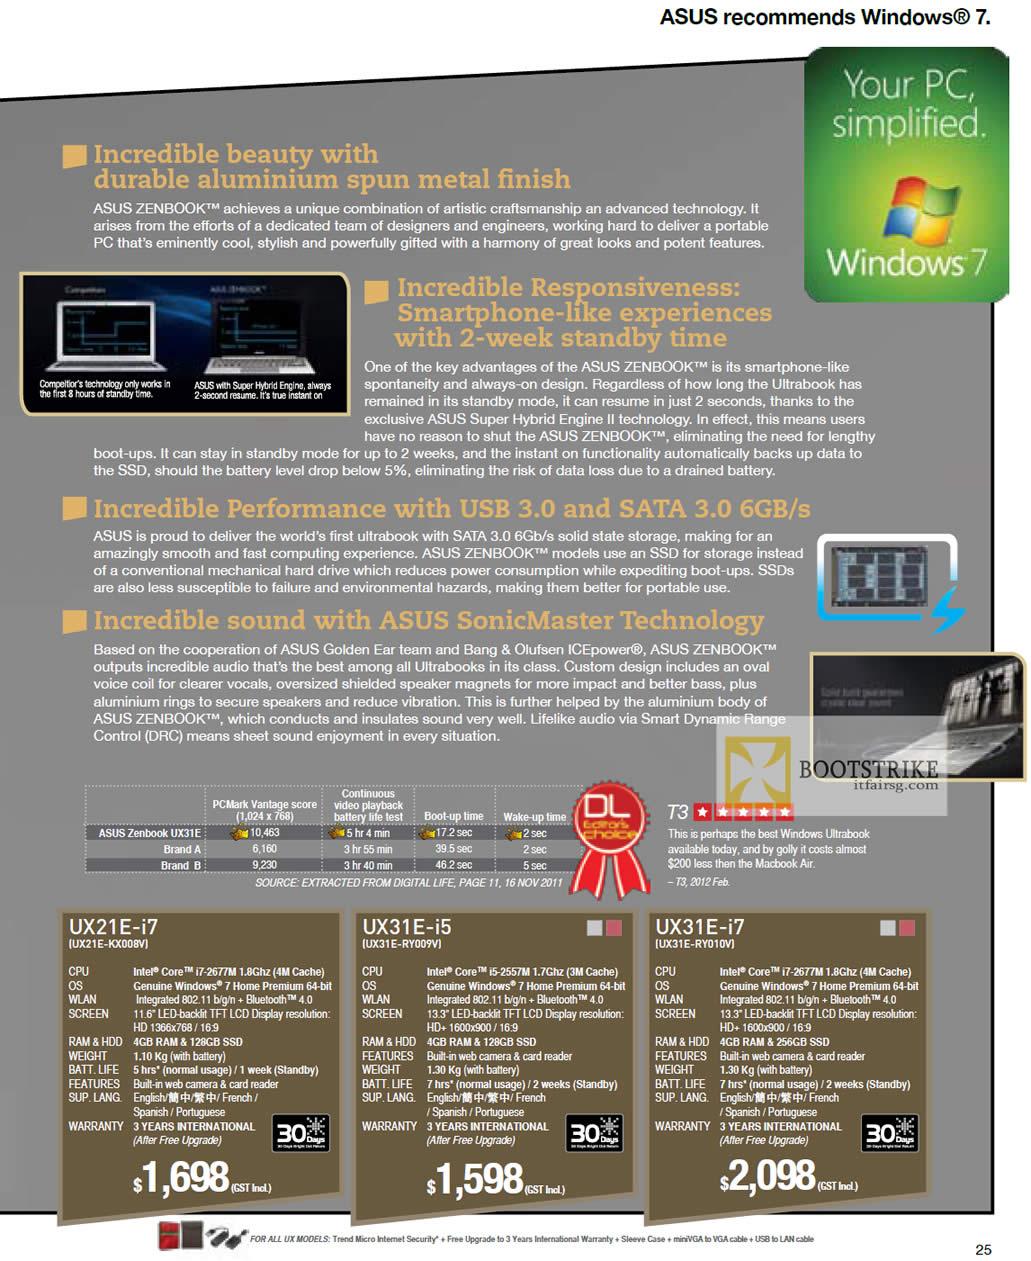 IT SHOW 2012 price list image brochure of ASUS Notebooks Zenbook Ultrabook Features, UX21E-KX008v, UX31E-RY009V, UX31E-RY010V